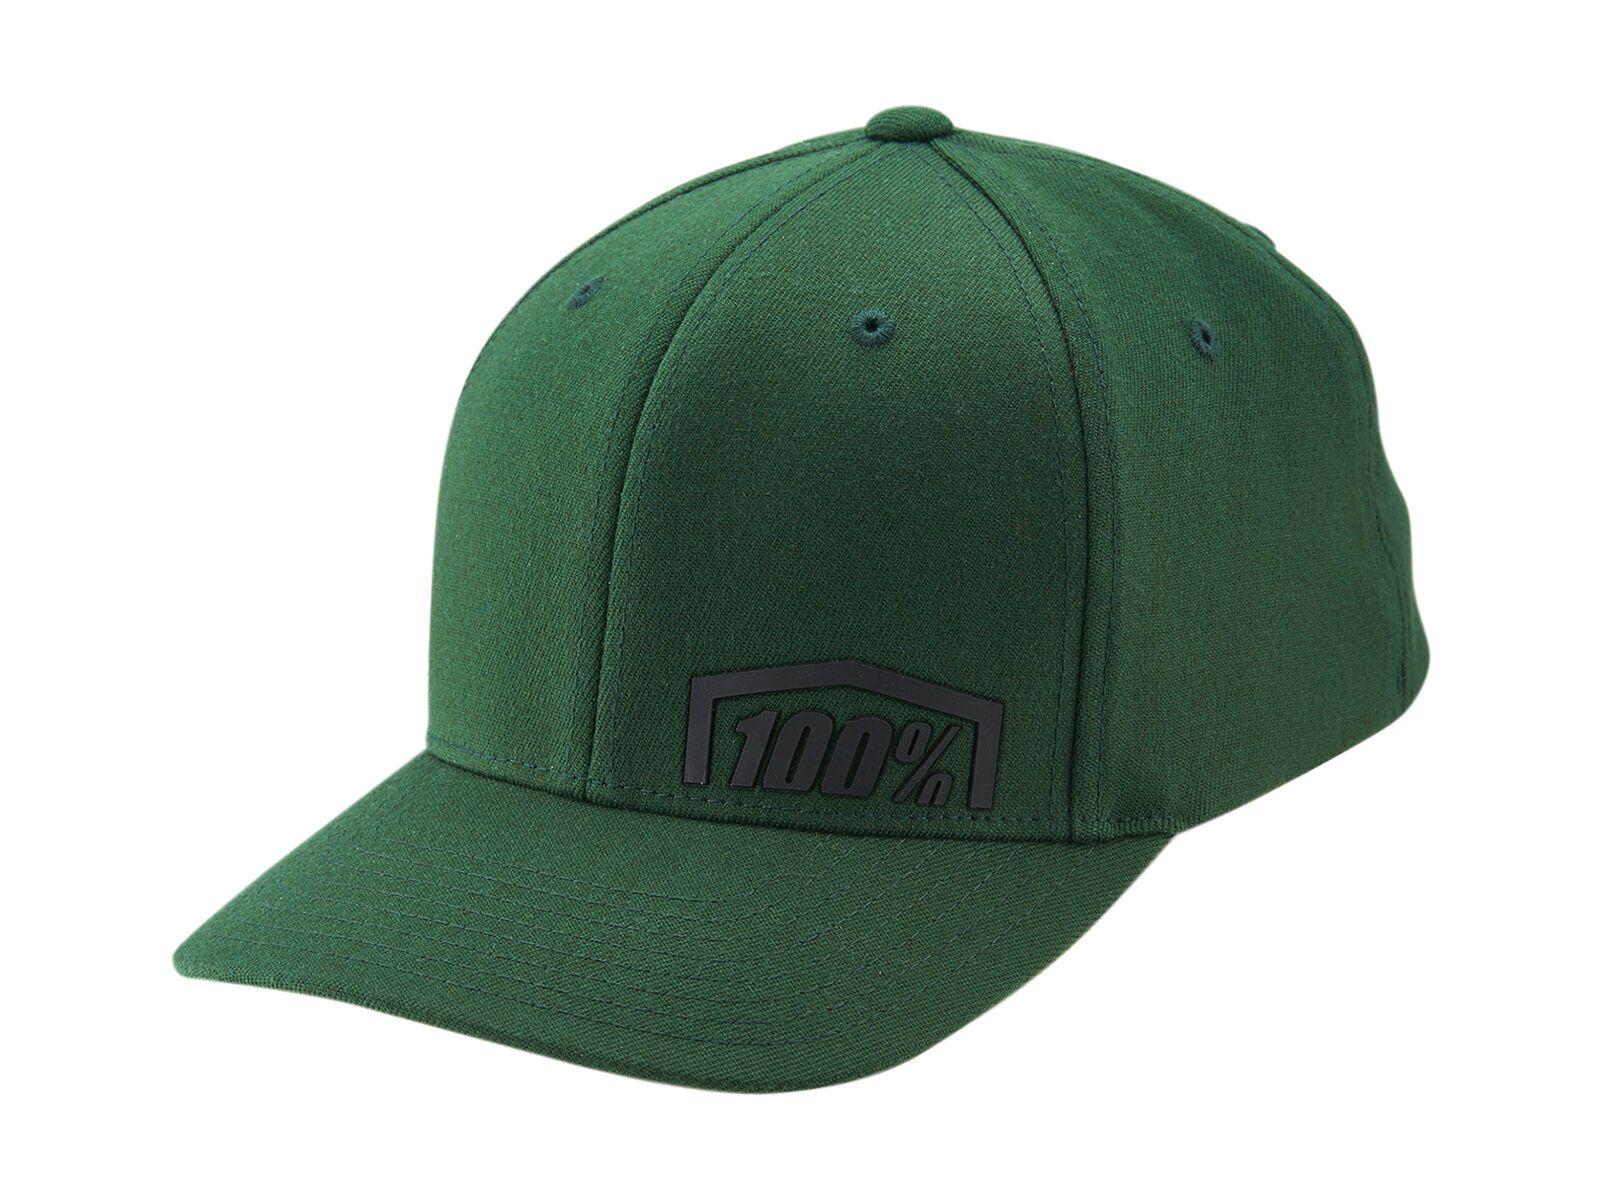 100% Revolt X-Fit FlexFit Hat, fatigue - Cap, Größe S/M HU-CAP-0059-S-M-2005-Fatigue